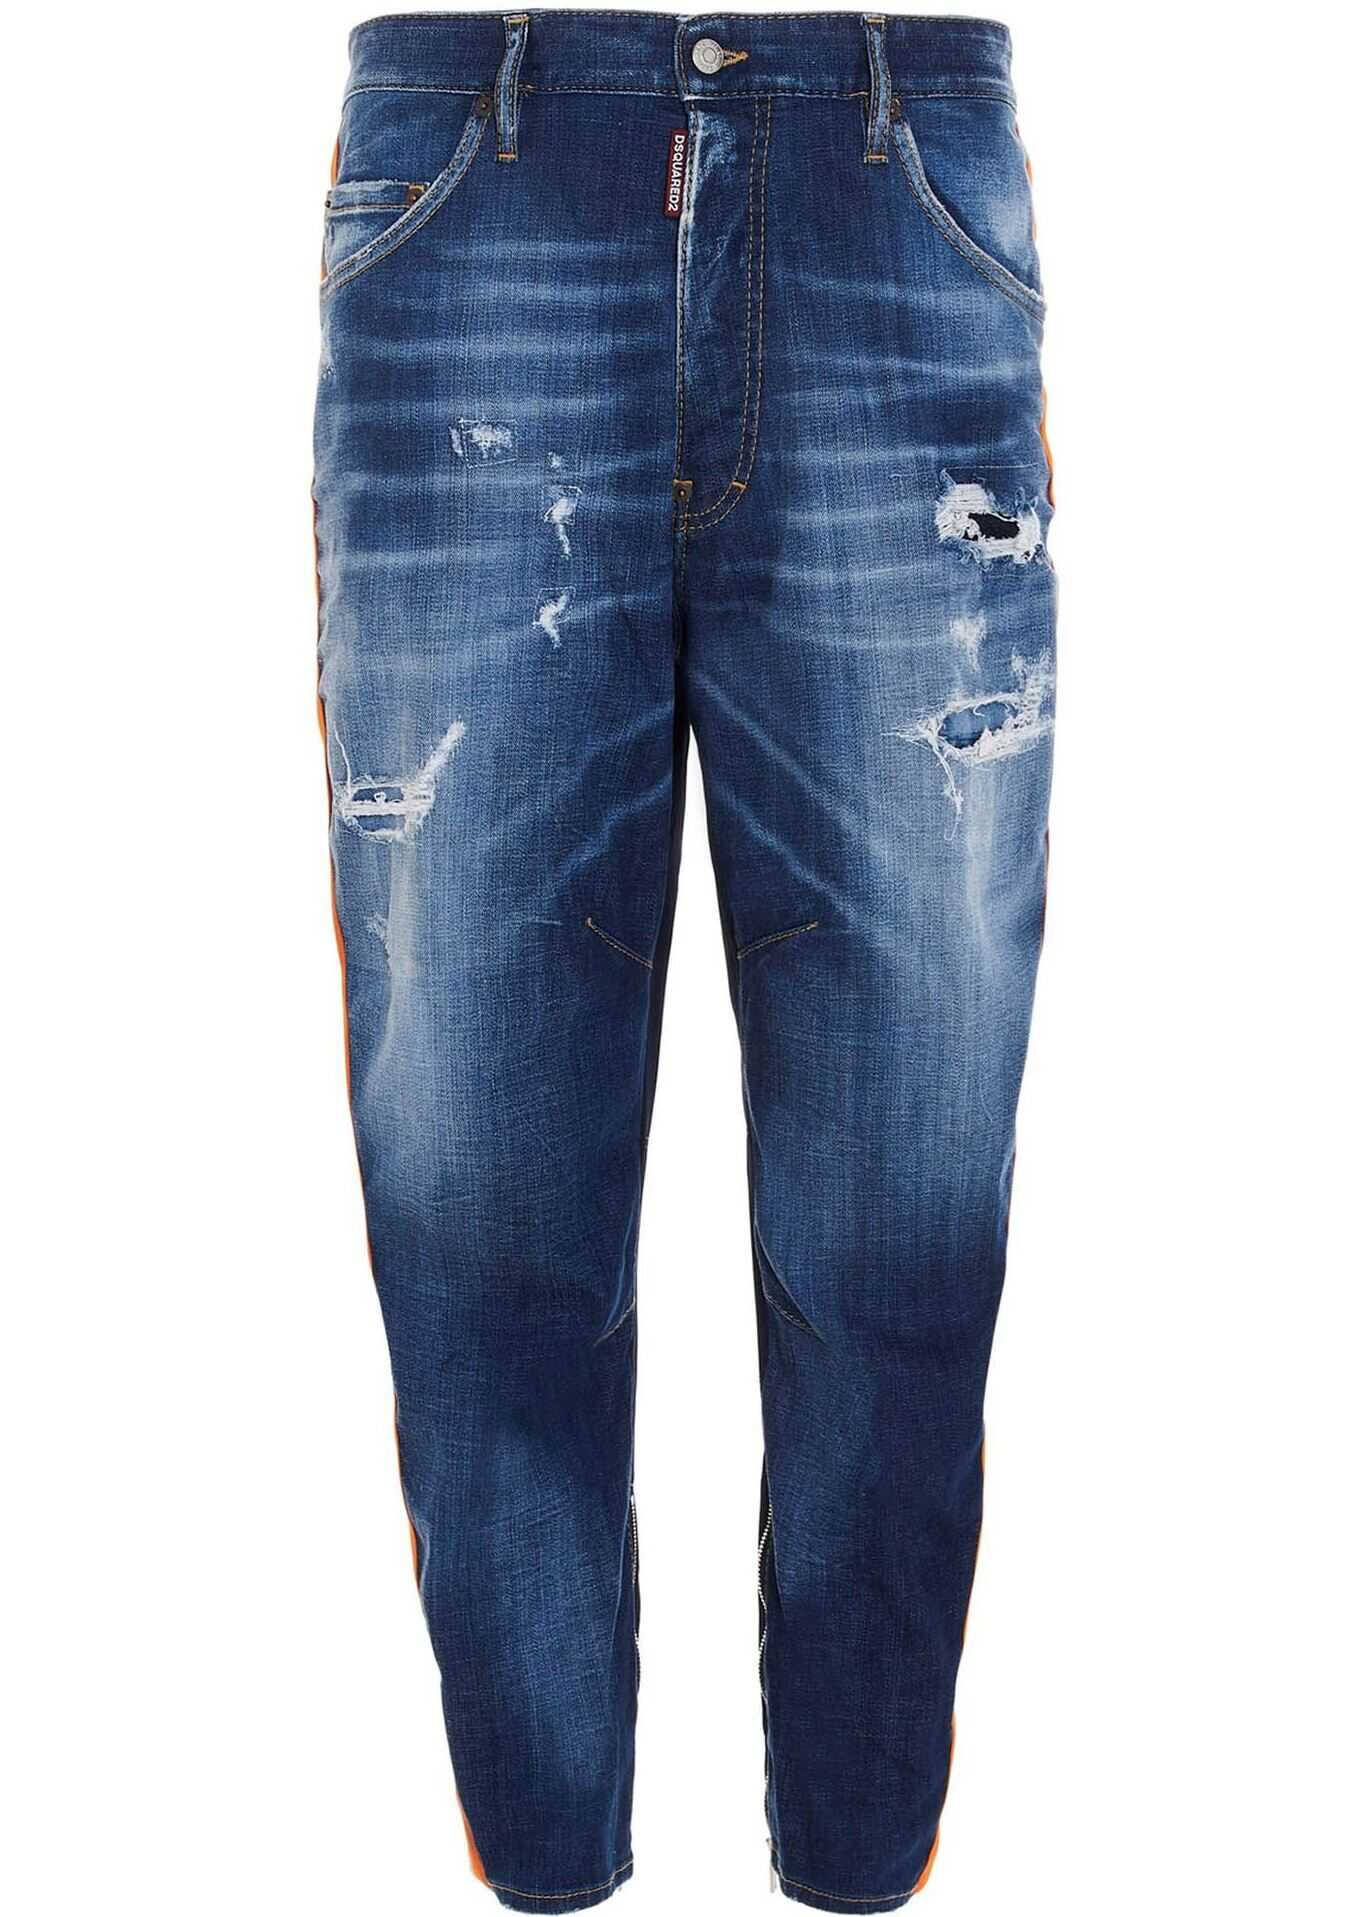 DSQUARED2 Combat Light Wash Jeans In Blue Blue imagine